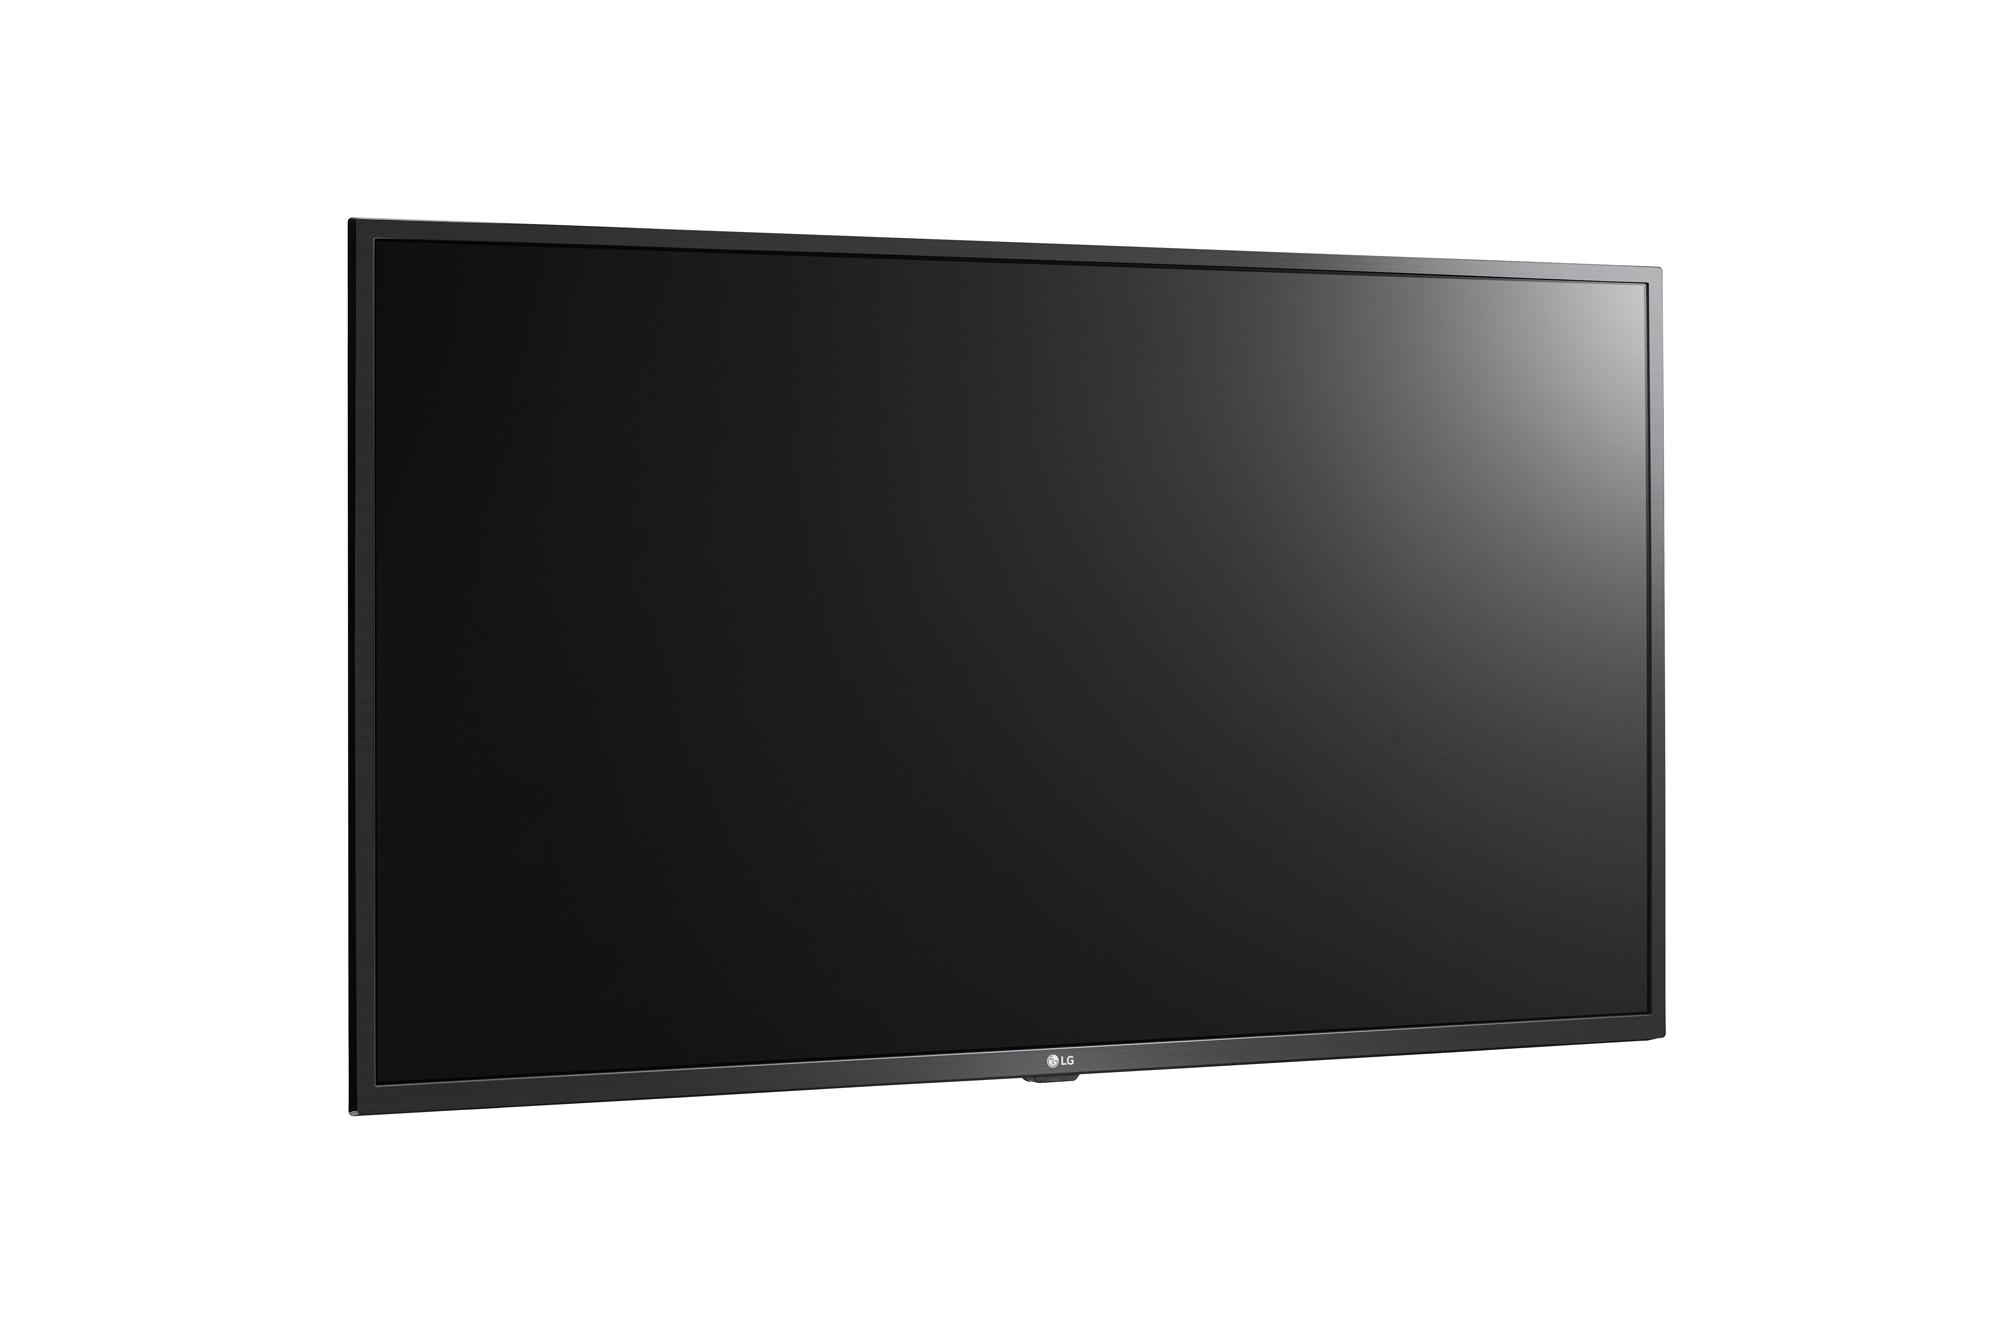 LG Smart TV Signage 43UT640S (CIS) 7